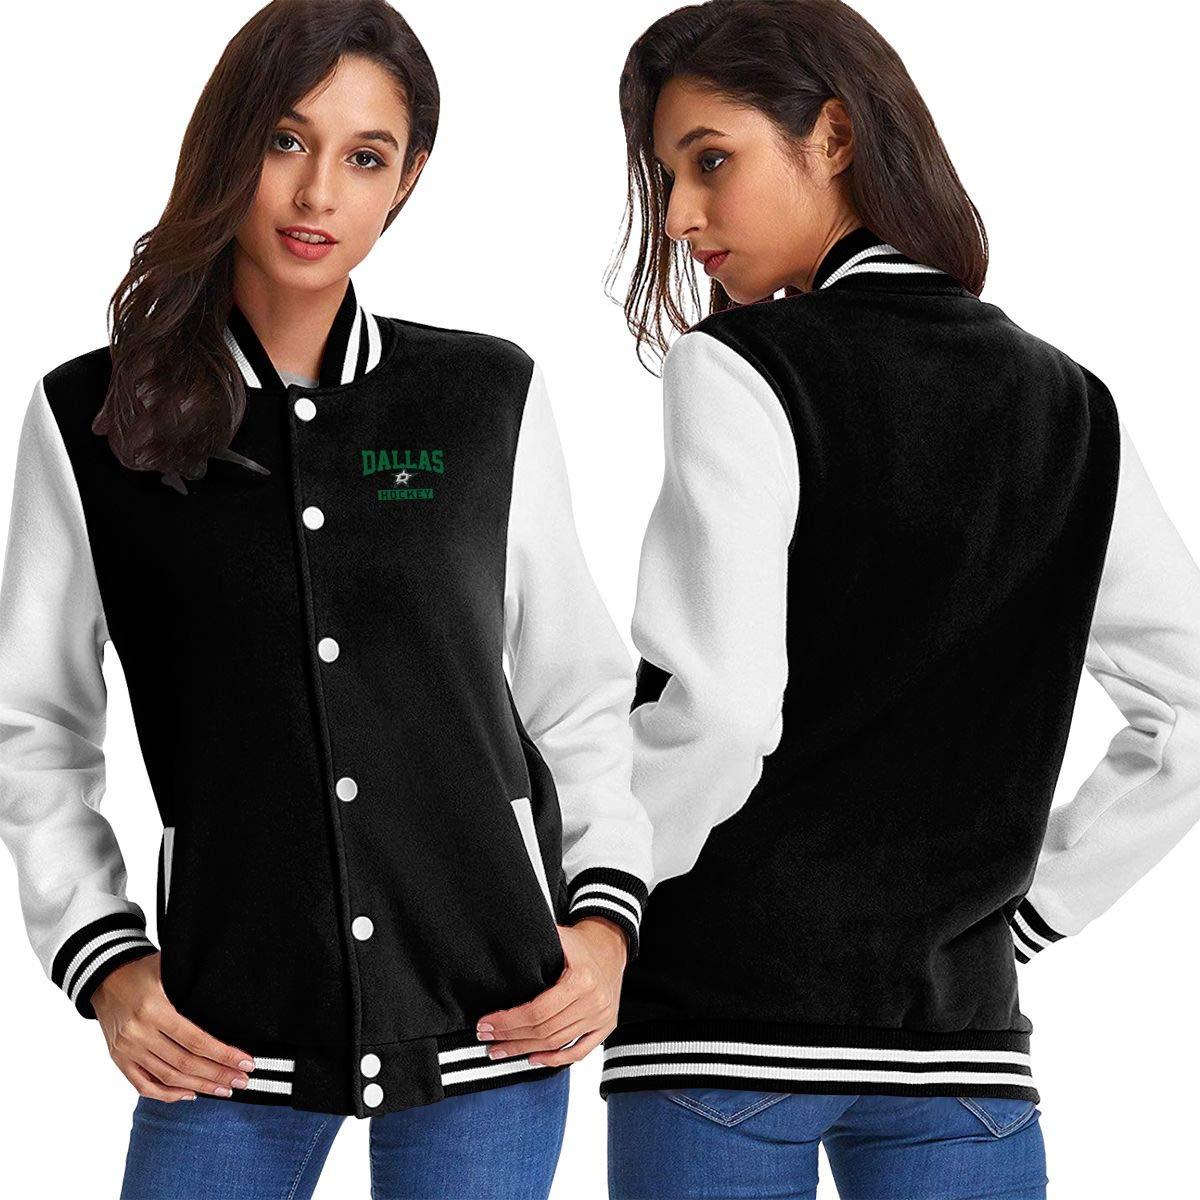 Black Women Basketballsadw 2015DallasStarsRinksideBlackCityPride Baseball Uniform Jacket